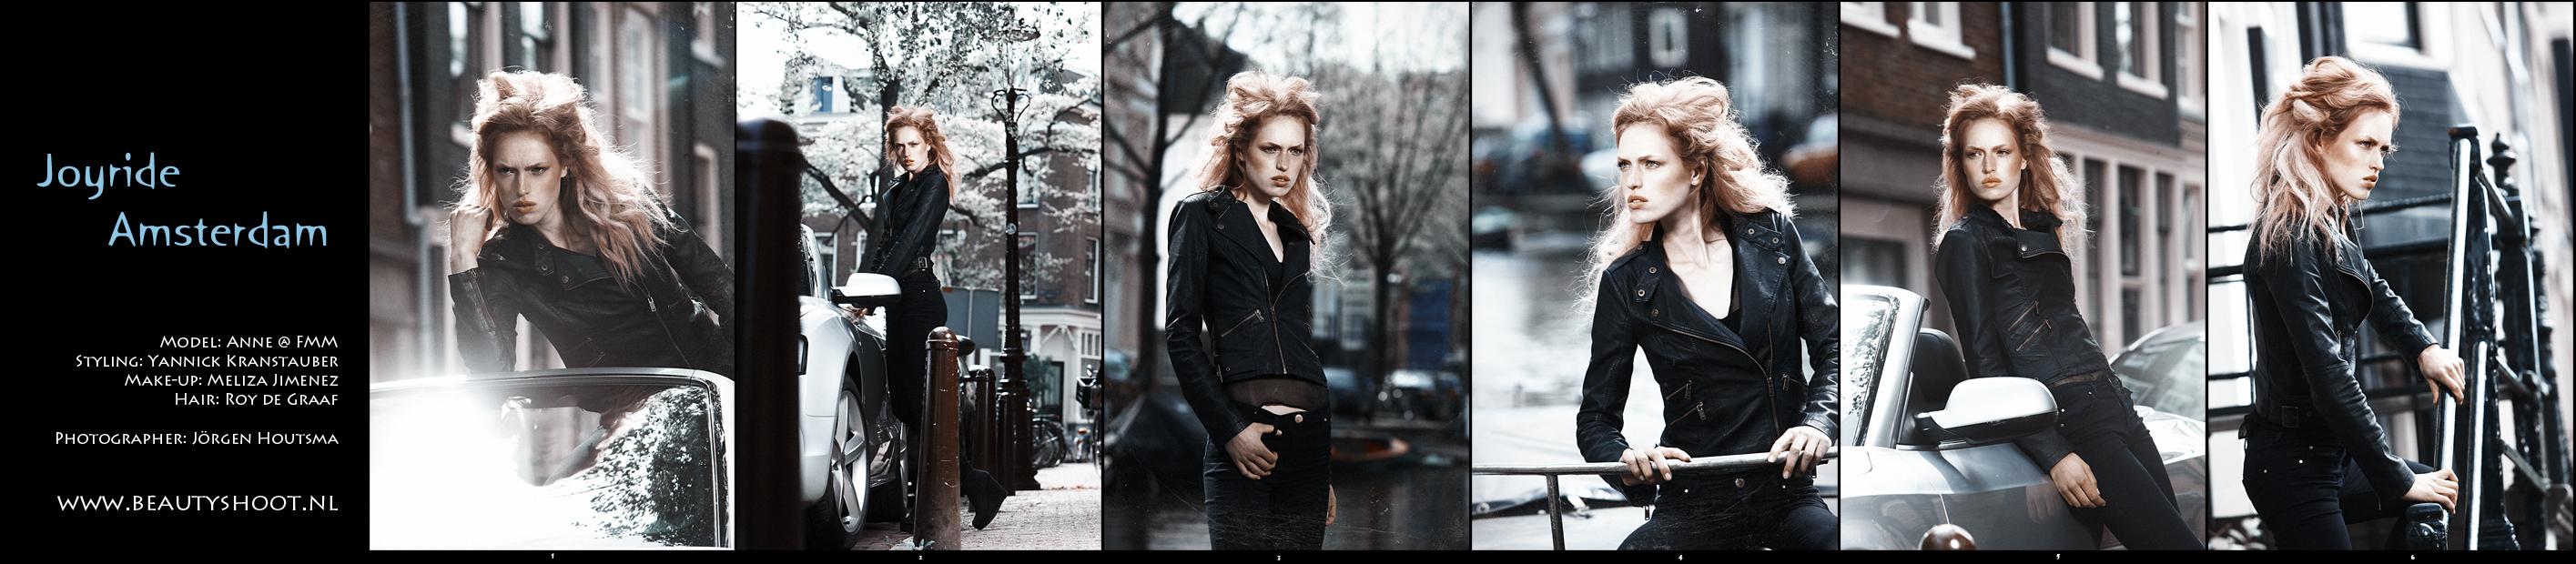 http://beautyshoot.nl/fotos/Modellen/2012-05-06-FMM/joyride.jpg